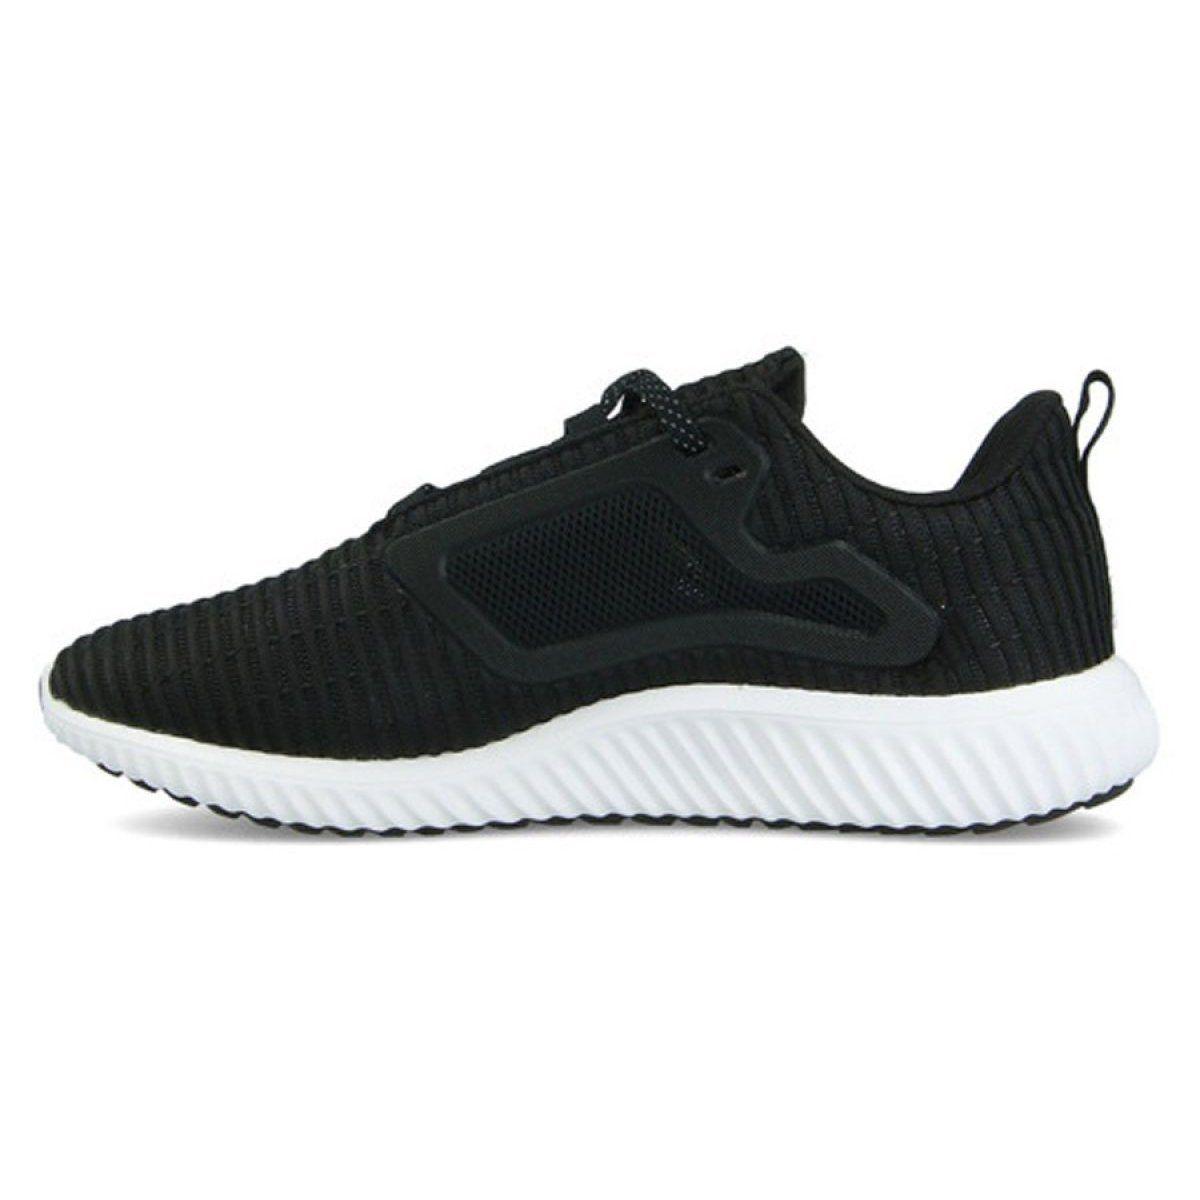 Buty Biegowe Adidas Climacool M Cm7405 Biale Czarne Adidas Running Shoes Stylish Running Shoes Adidas Co